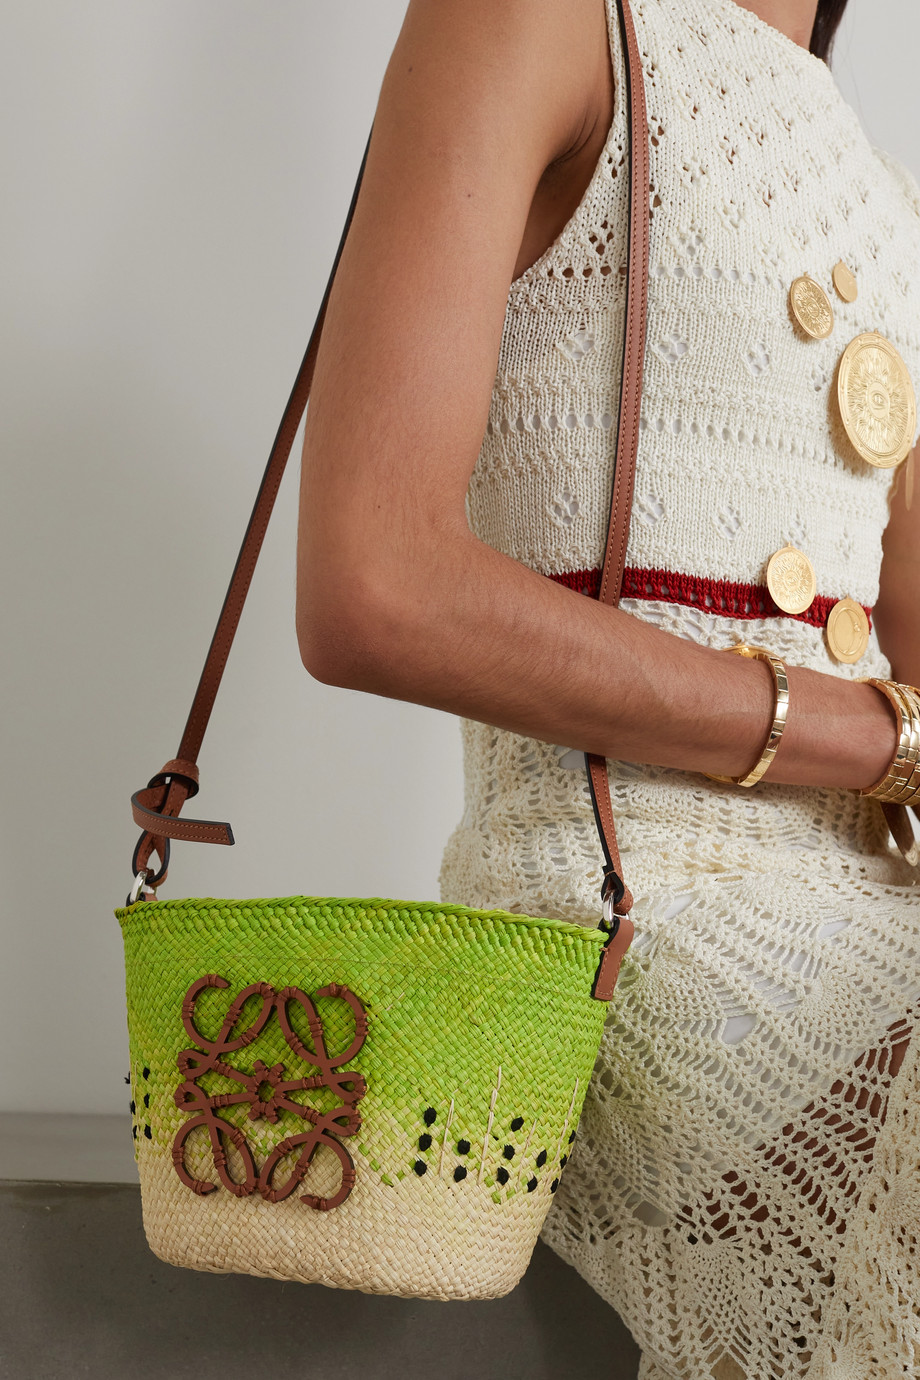 Loewe + Paula's Ibiza Pochette leather-trimmed raffia shoulder bag